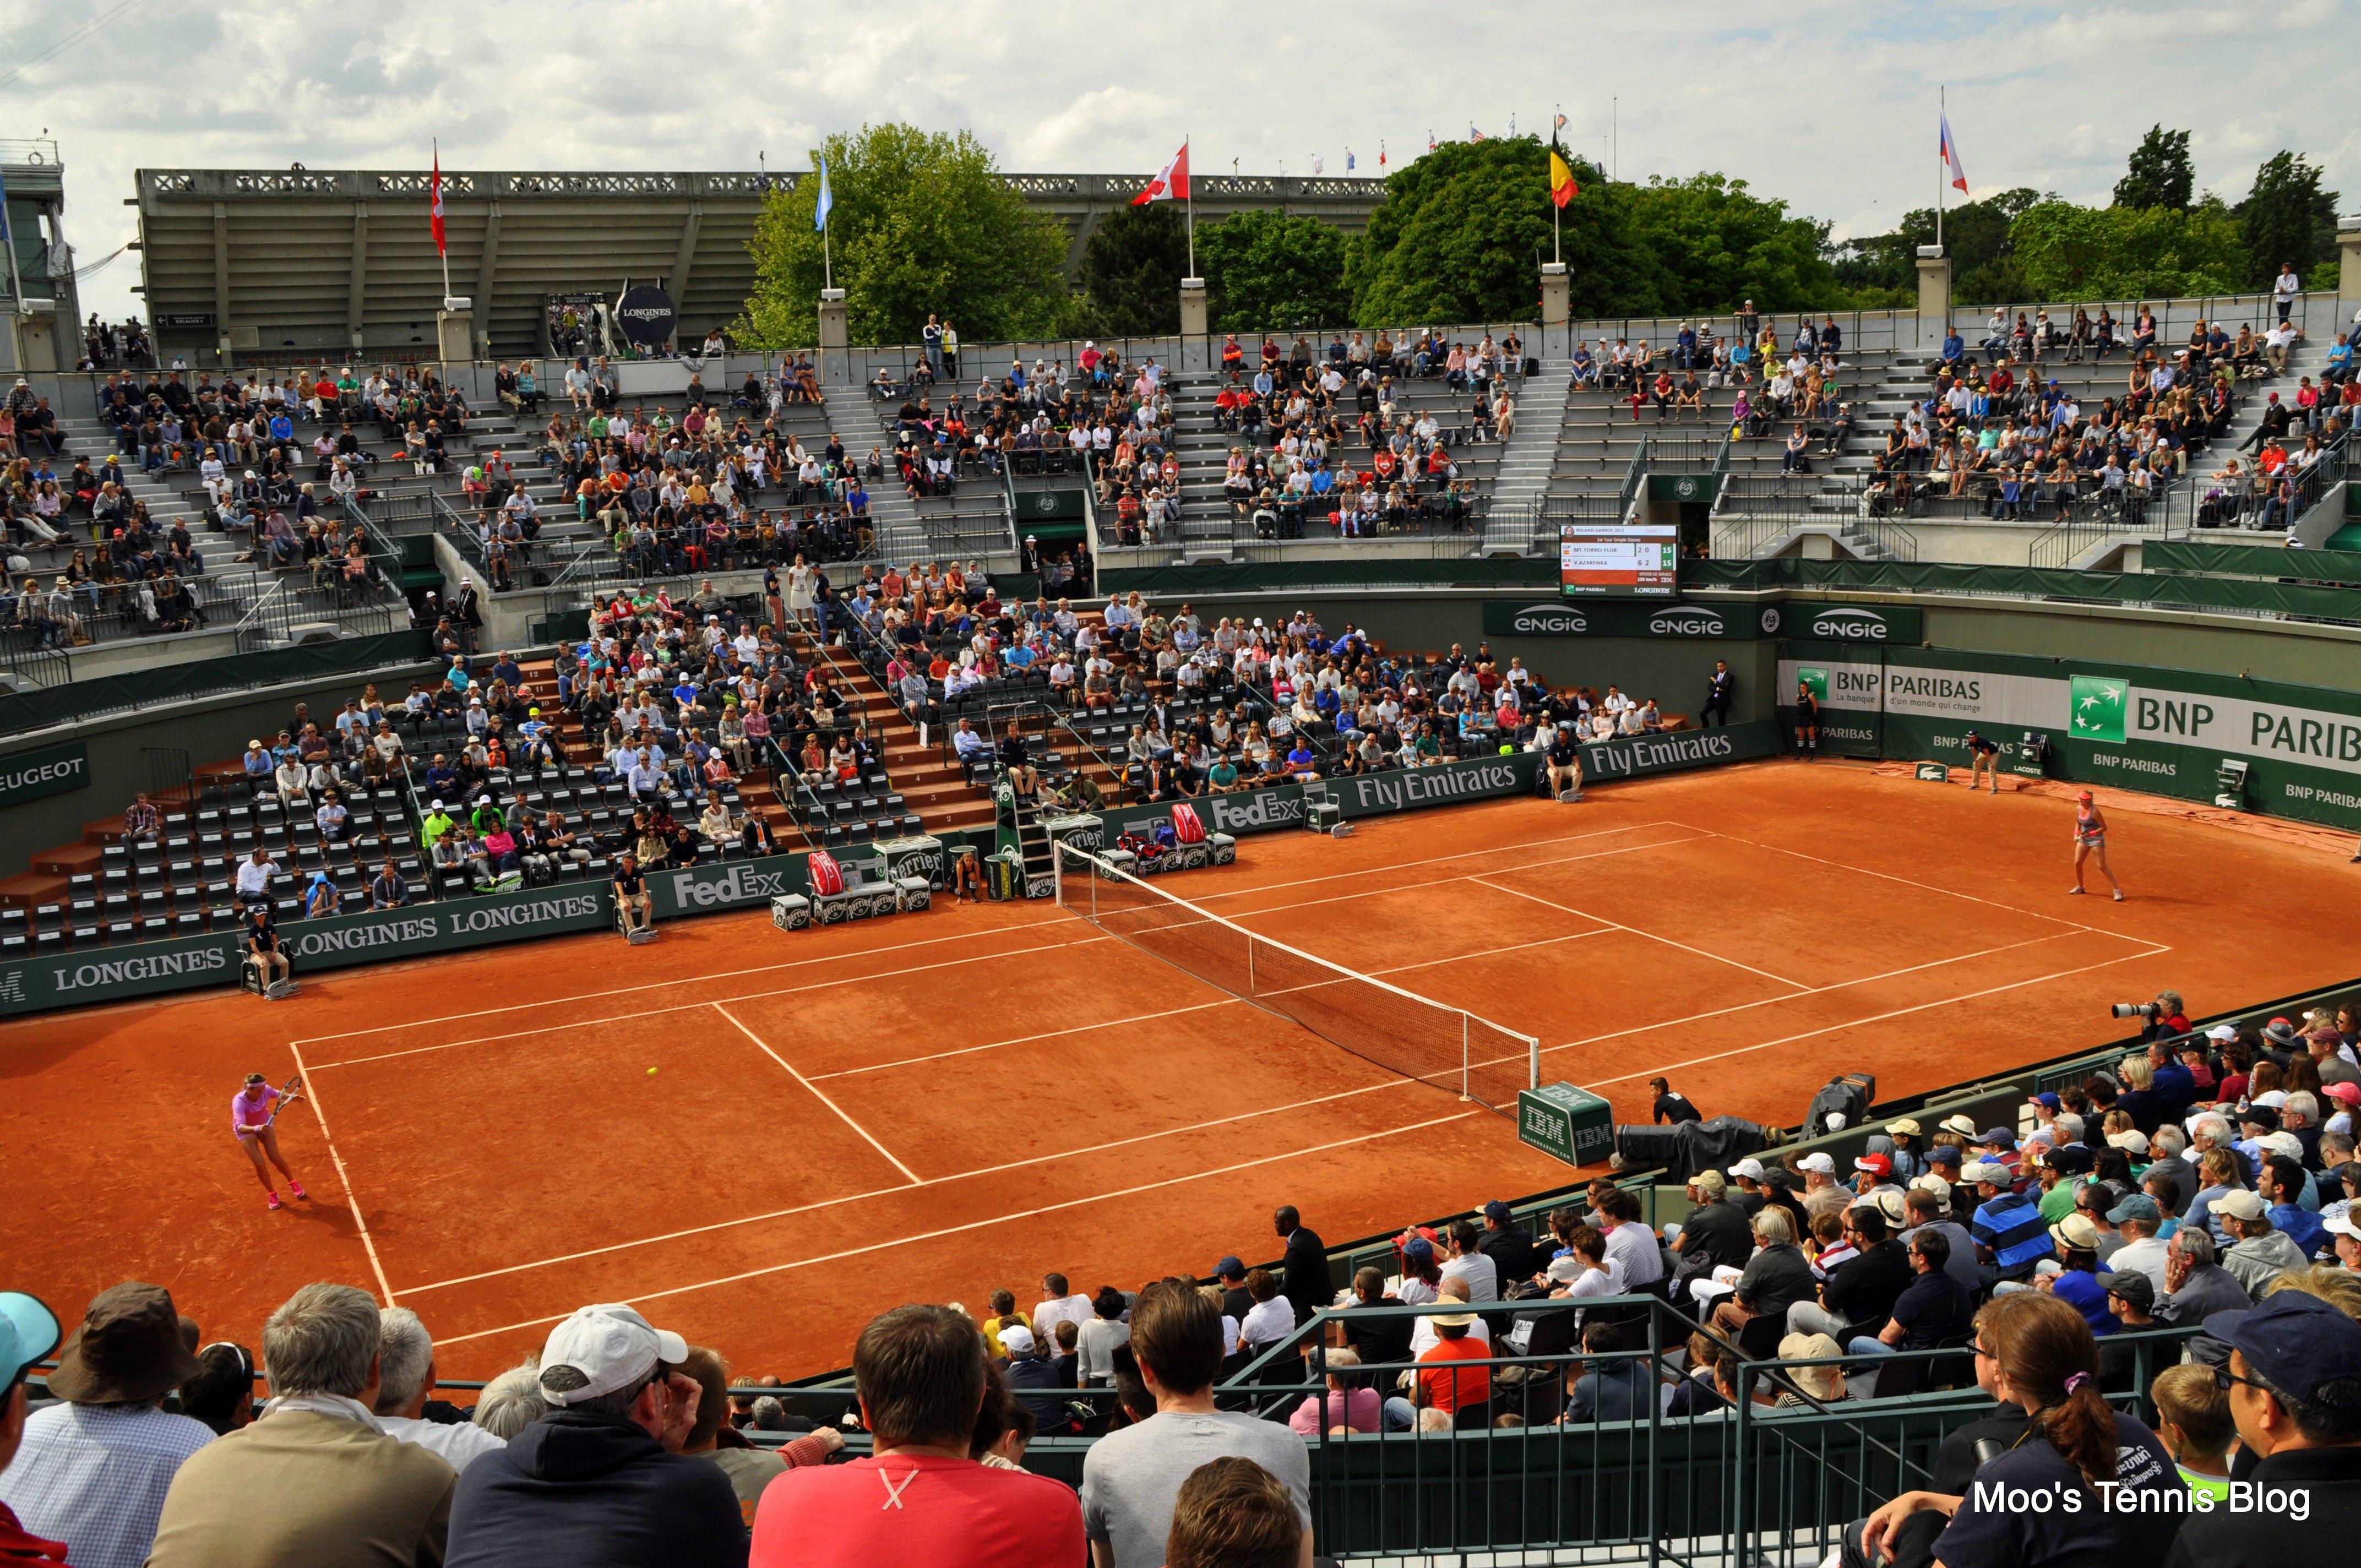 Roland Garros 2015: A day on Court 1   Moo's Tennis Blog